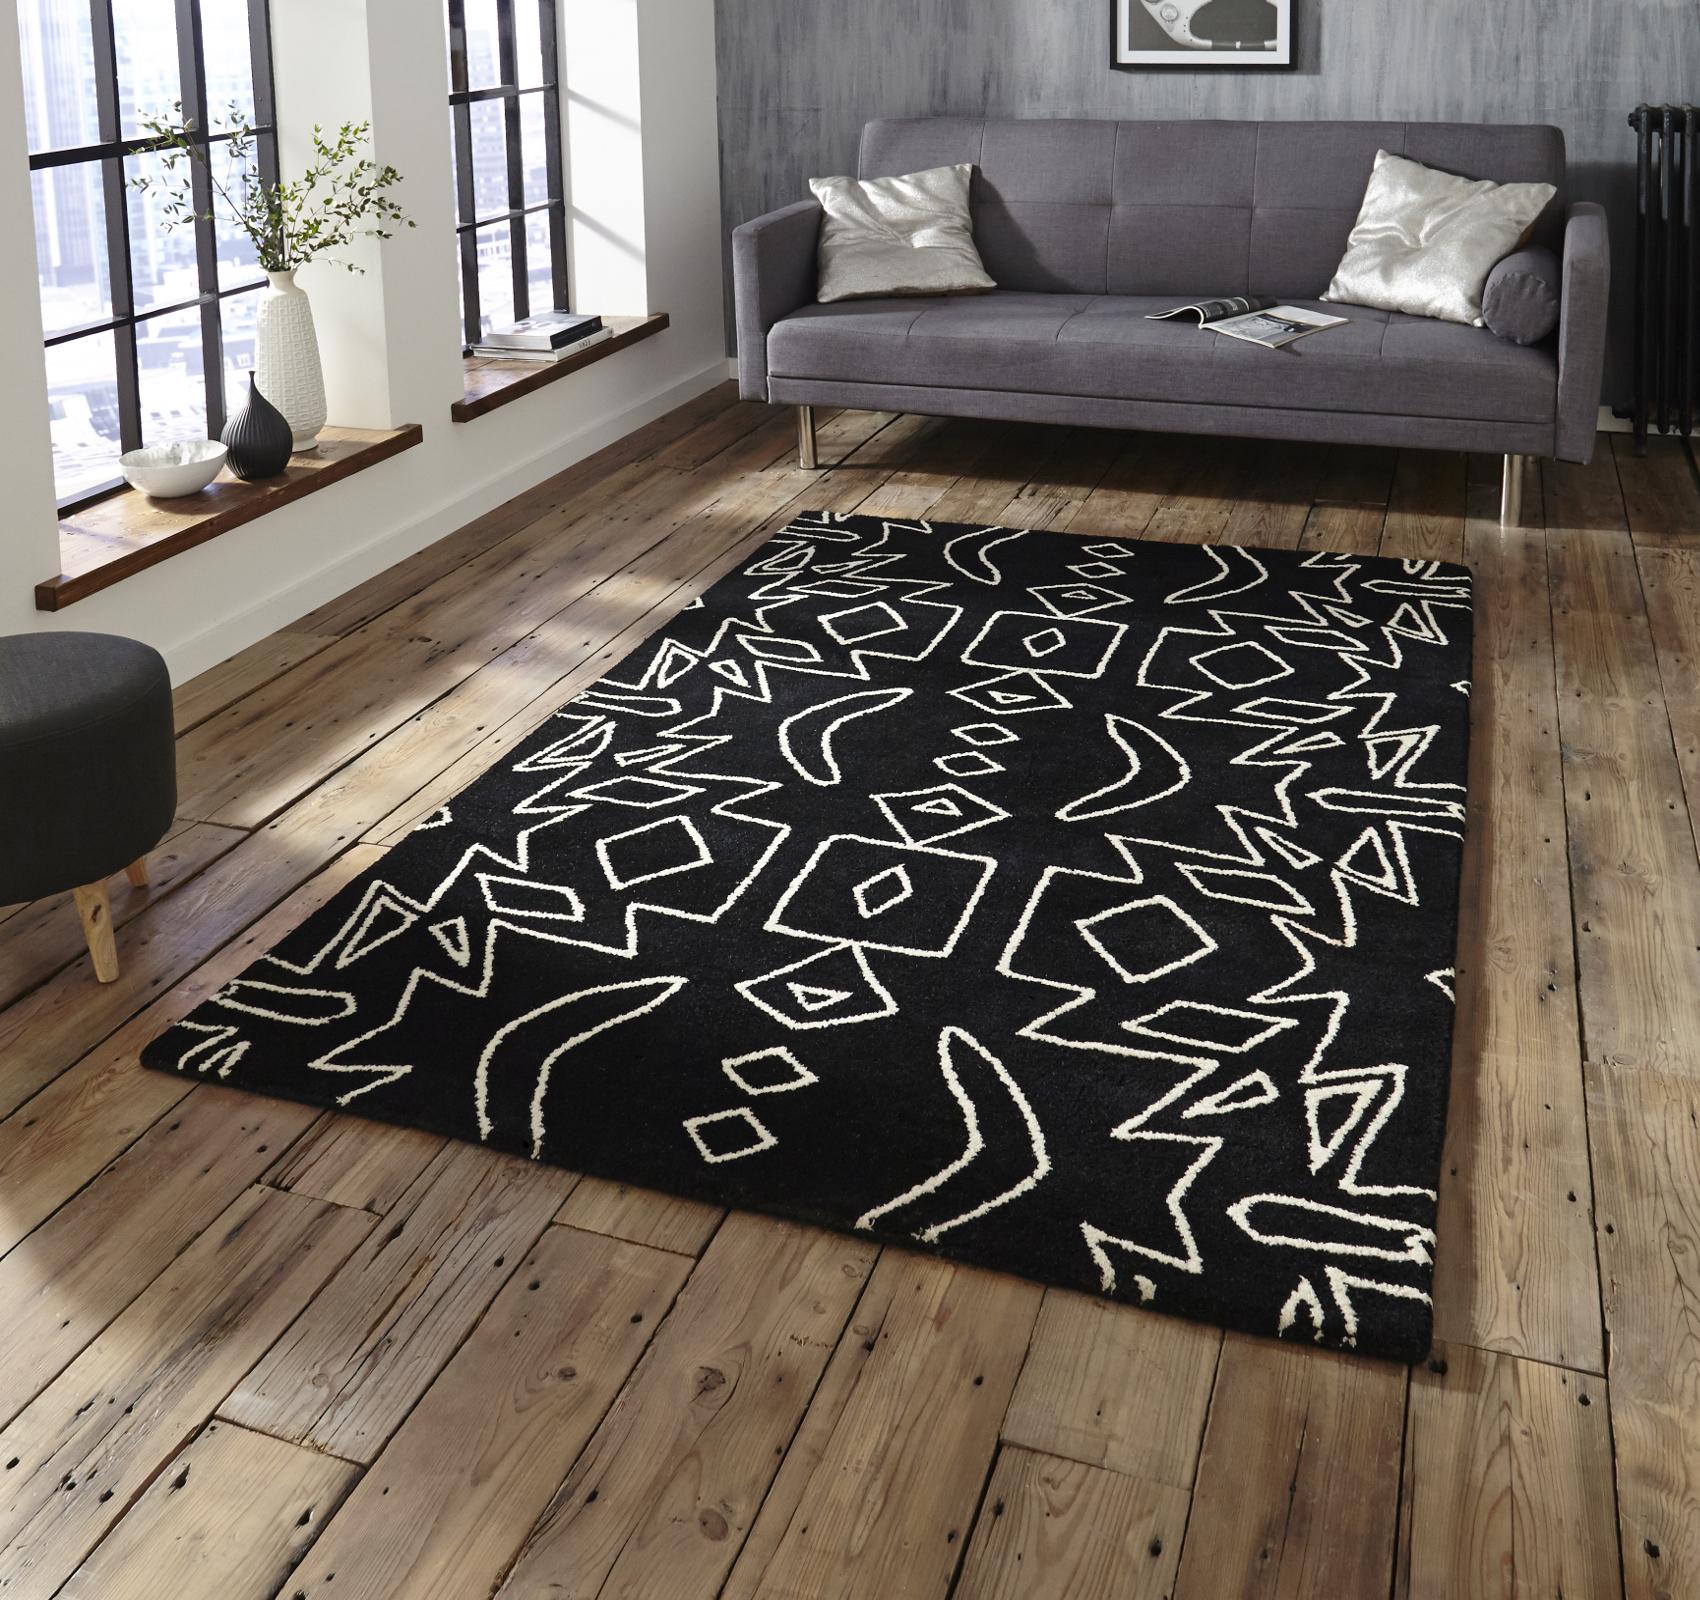 Black And White Floor Rug: Black White Modern Tribal Rug 100% Wool Monochrome Hand